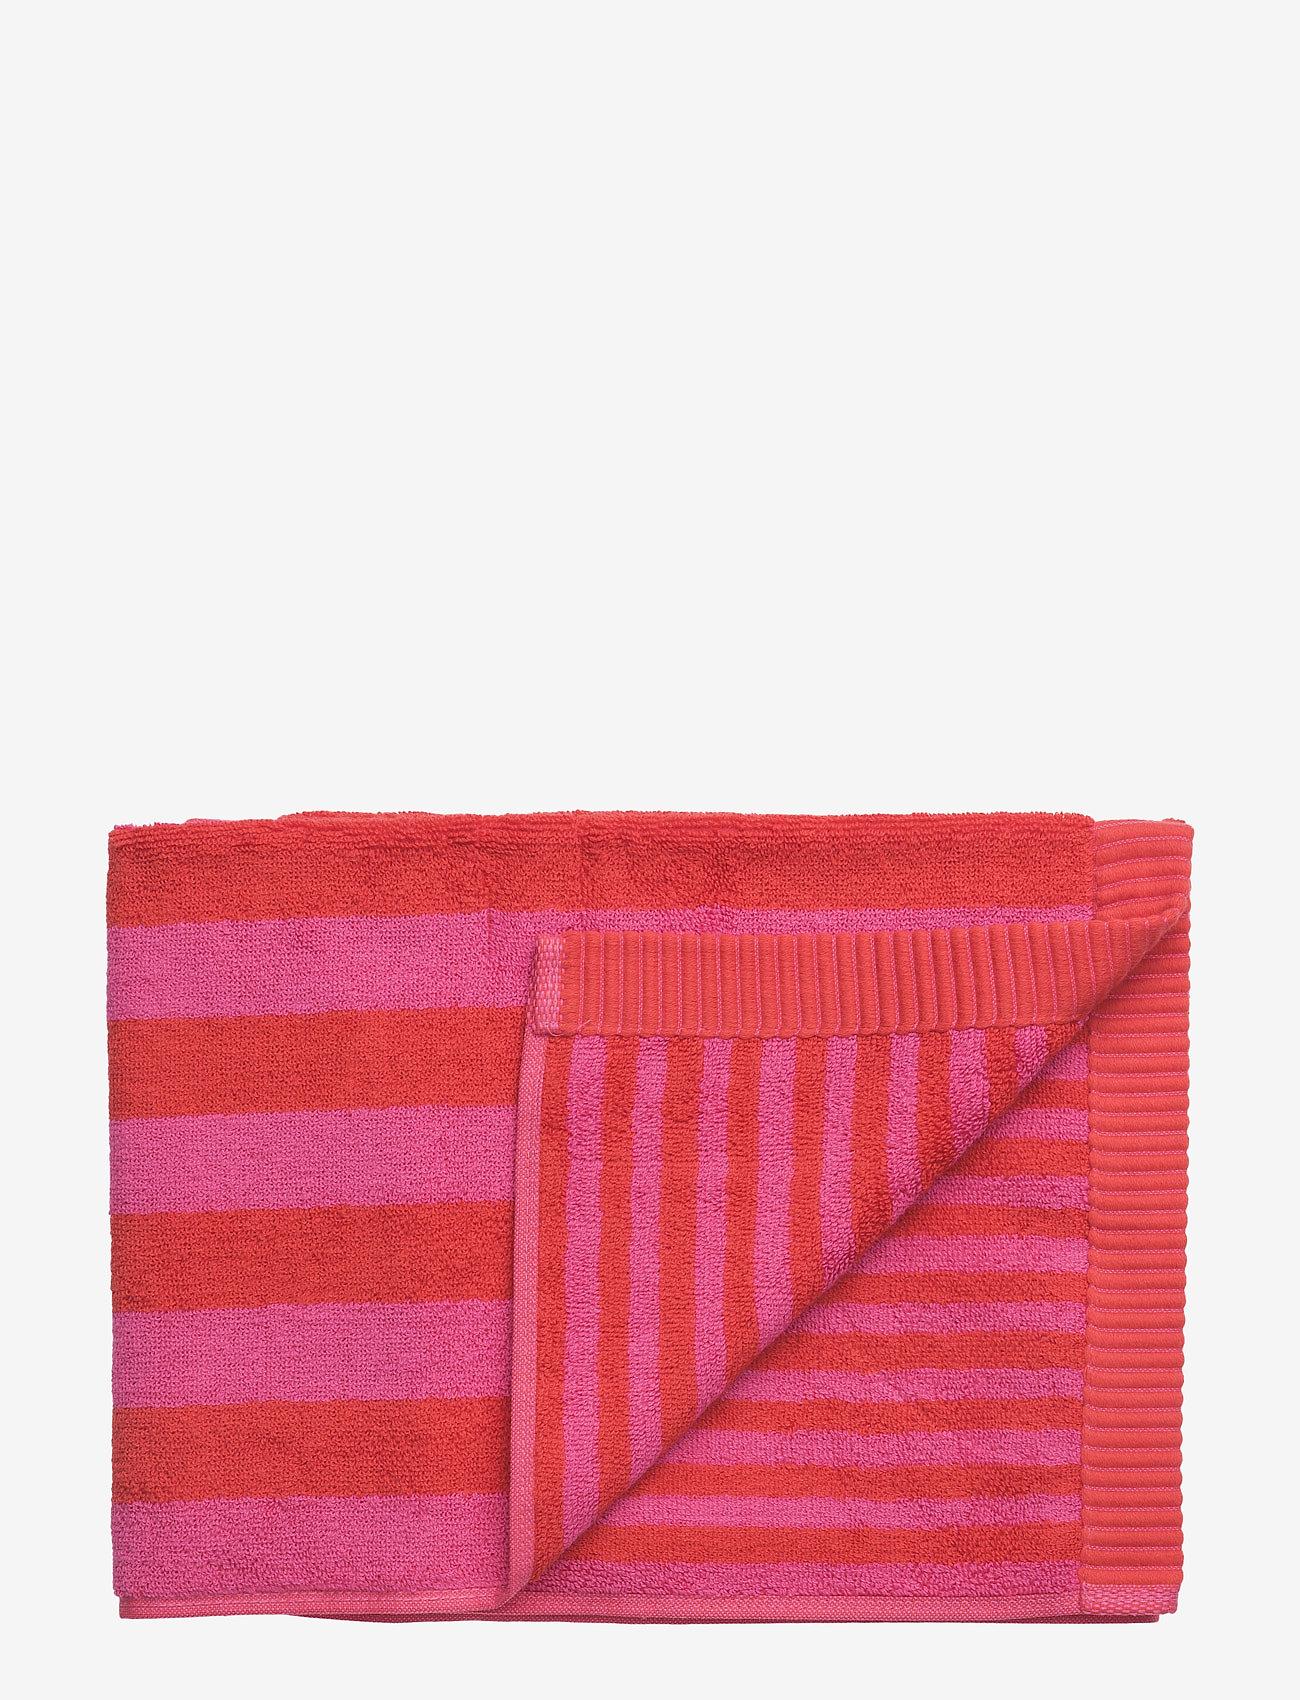 Marimekko Home - KAKSI RAITAA HAND TOWEL - ręczniki kąpielowe - red, red - 0